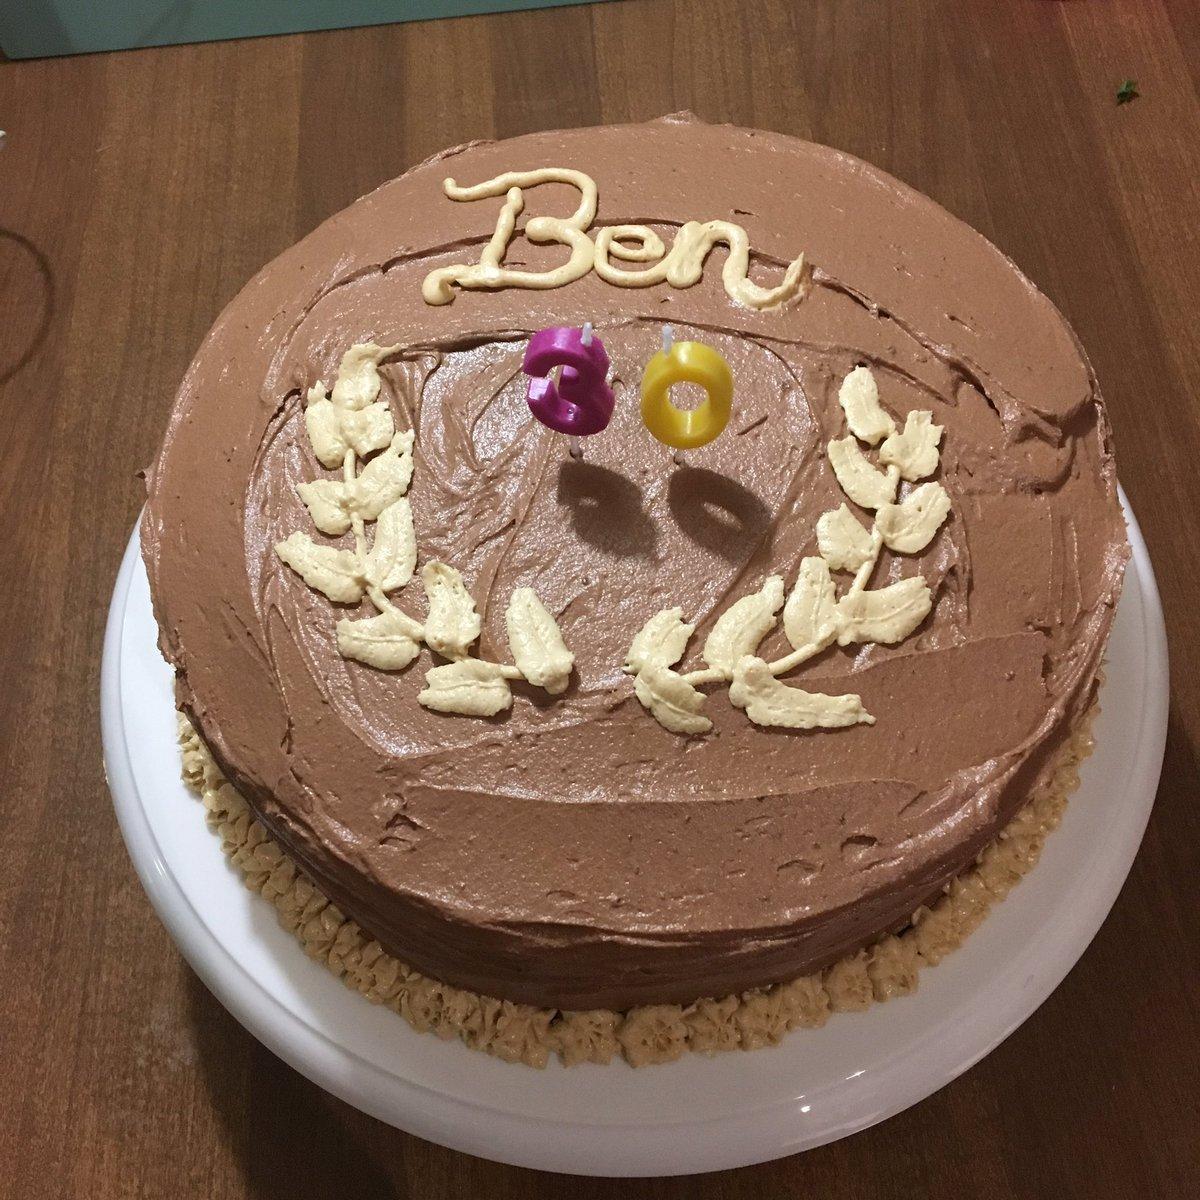 Amy On Twitter Birthday Cake For Professorbroman Happy Birthday